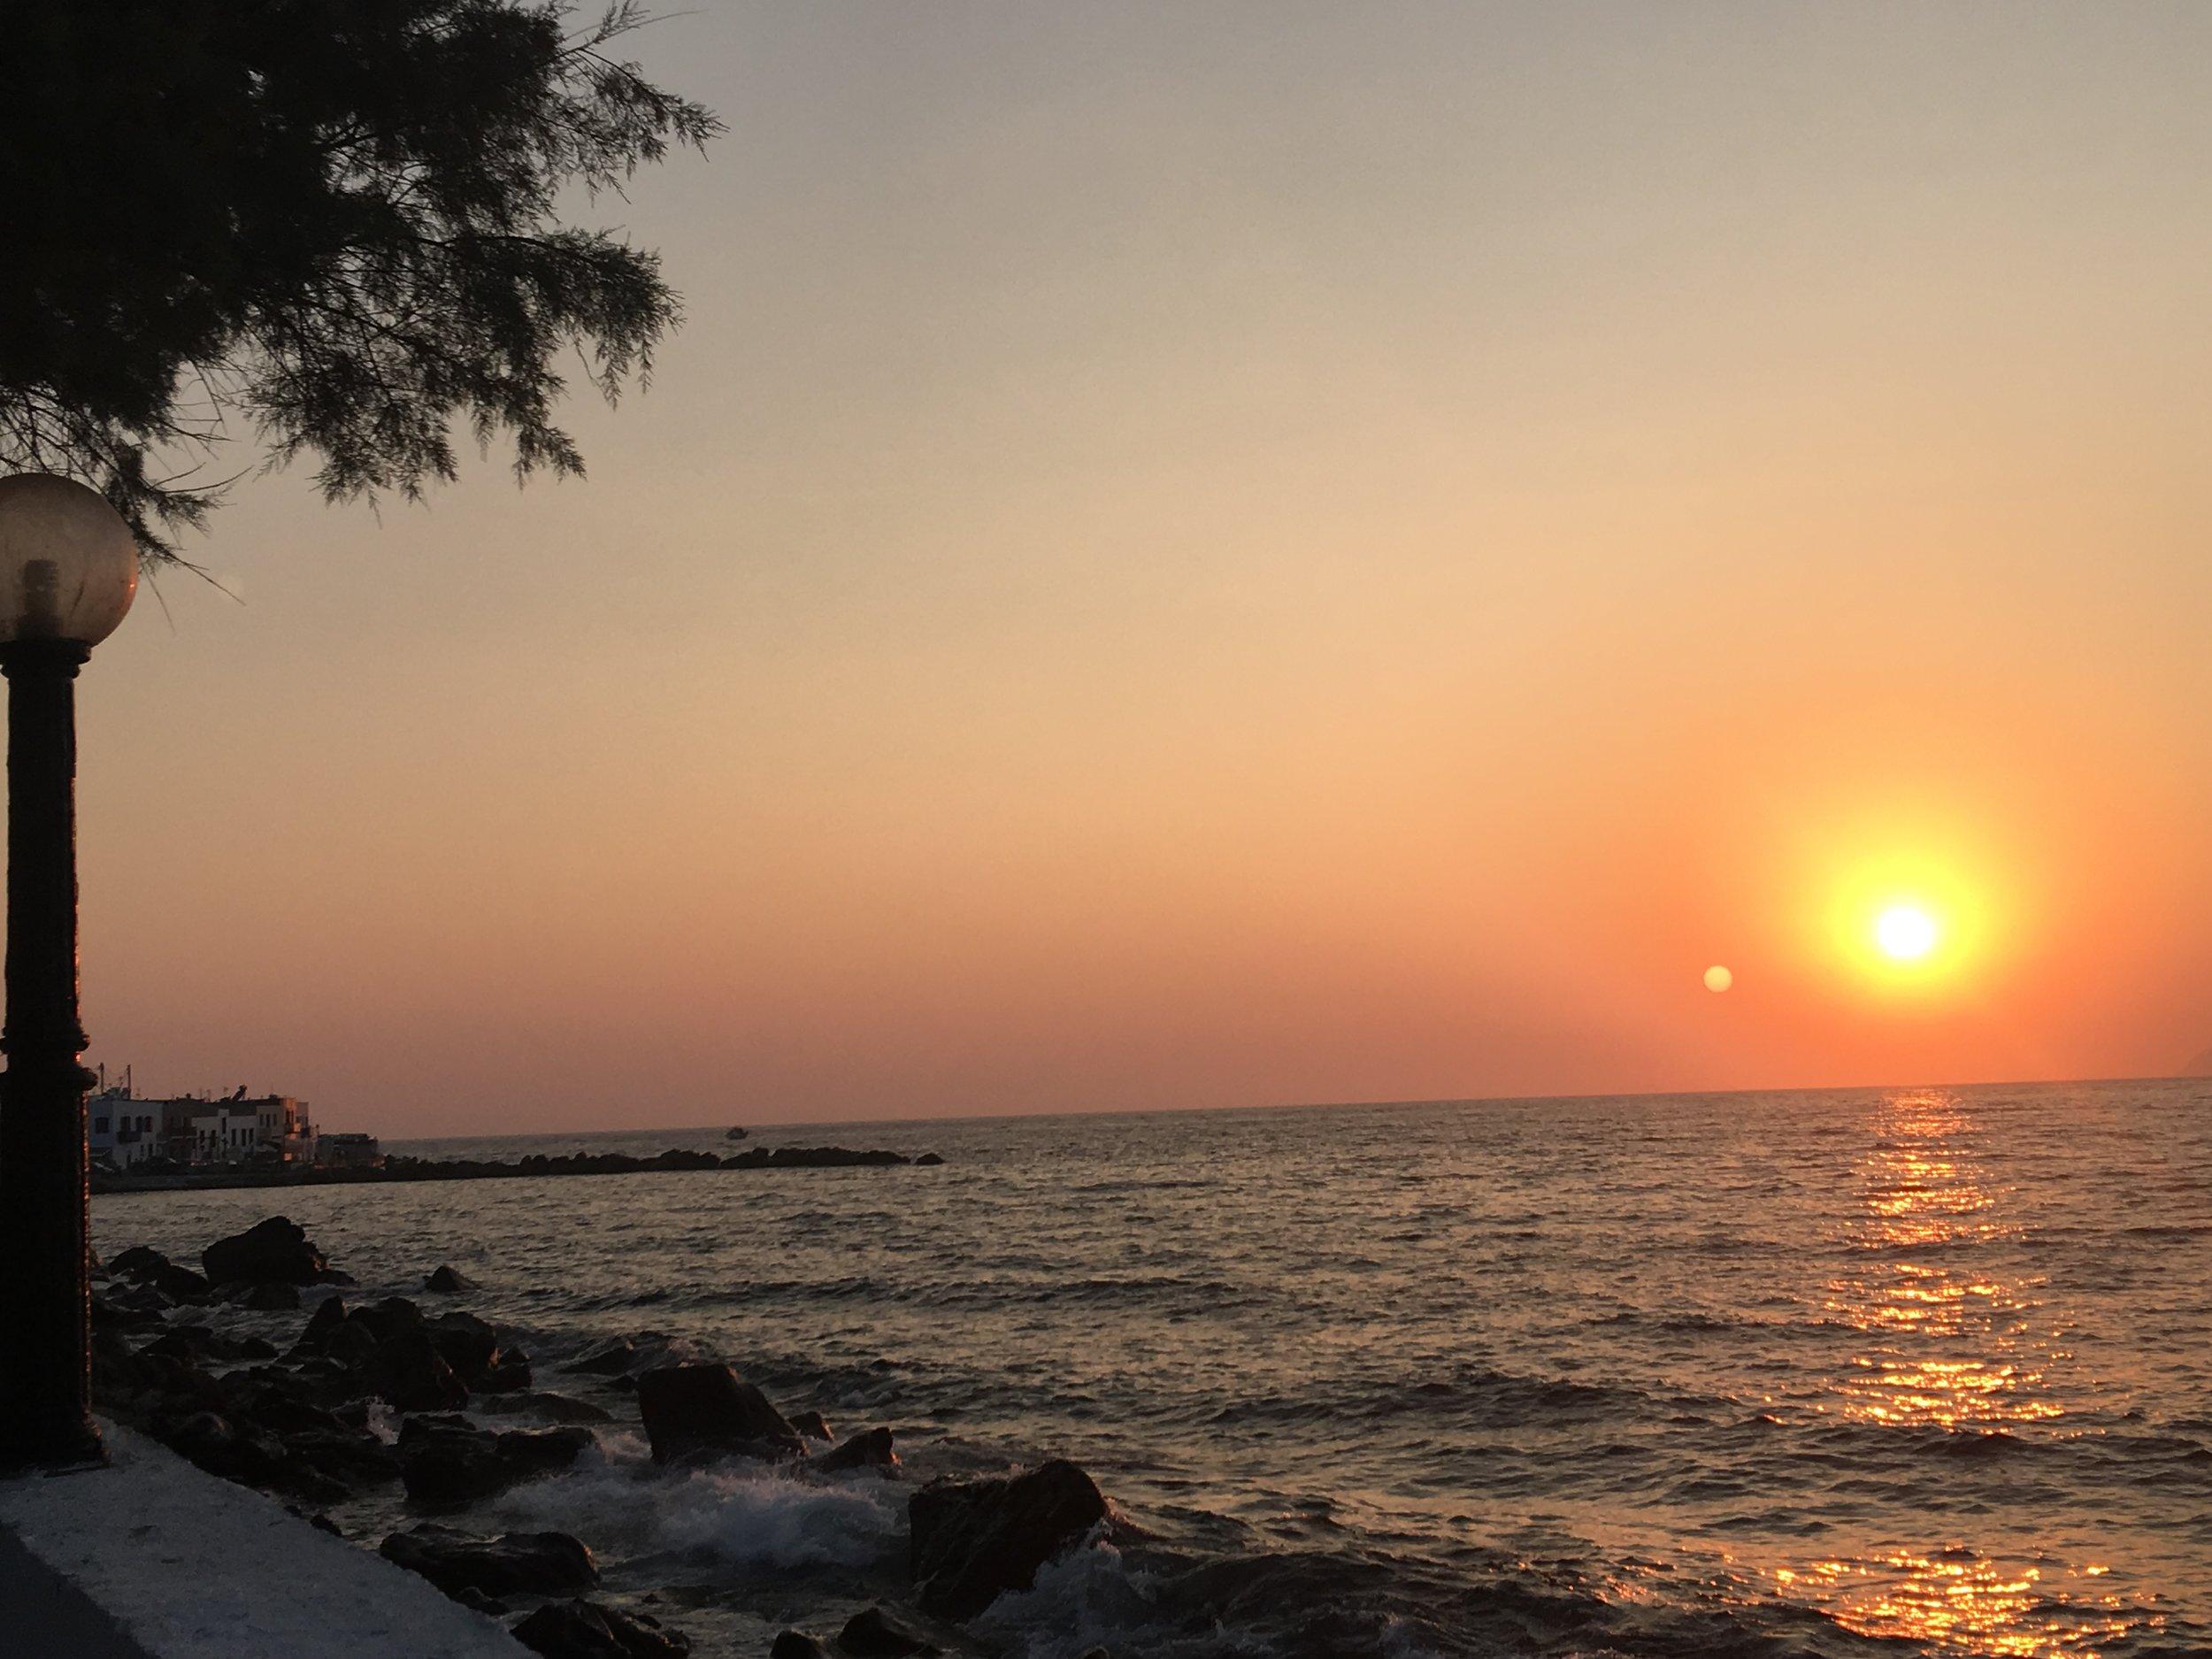 Beautiful sunset on the island of Nisyros, Greece